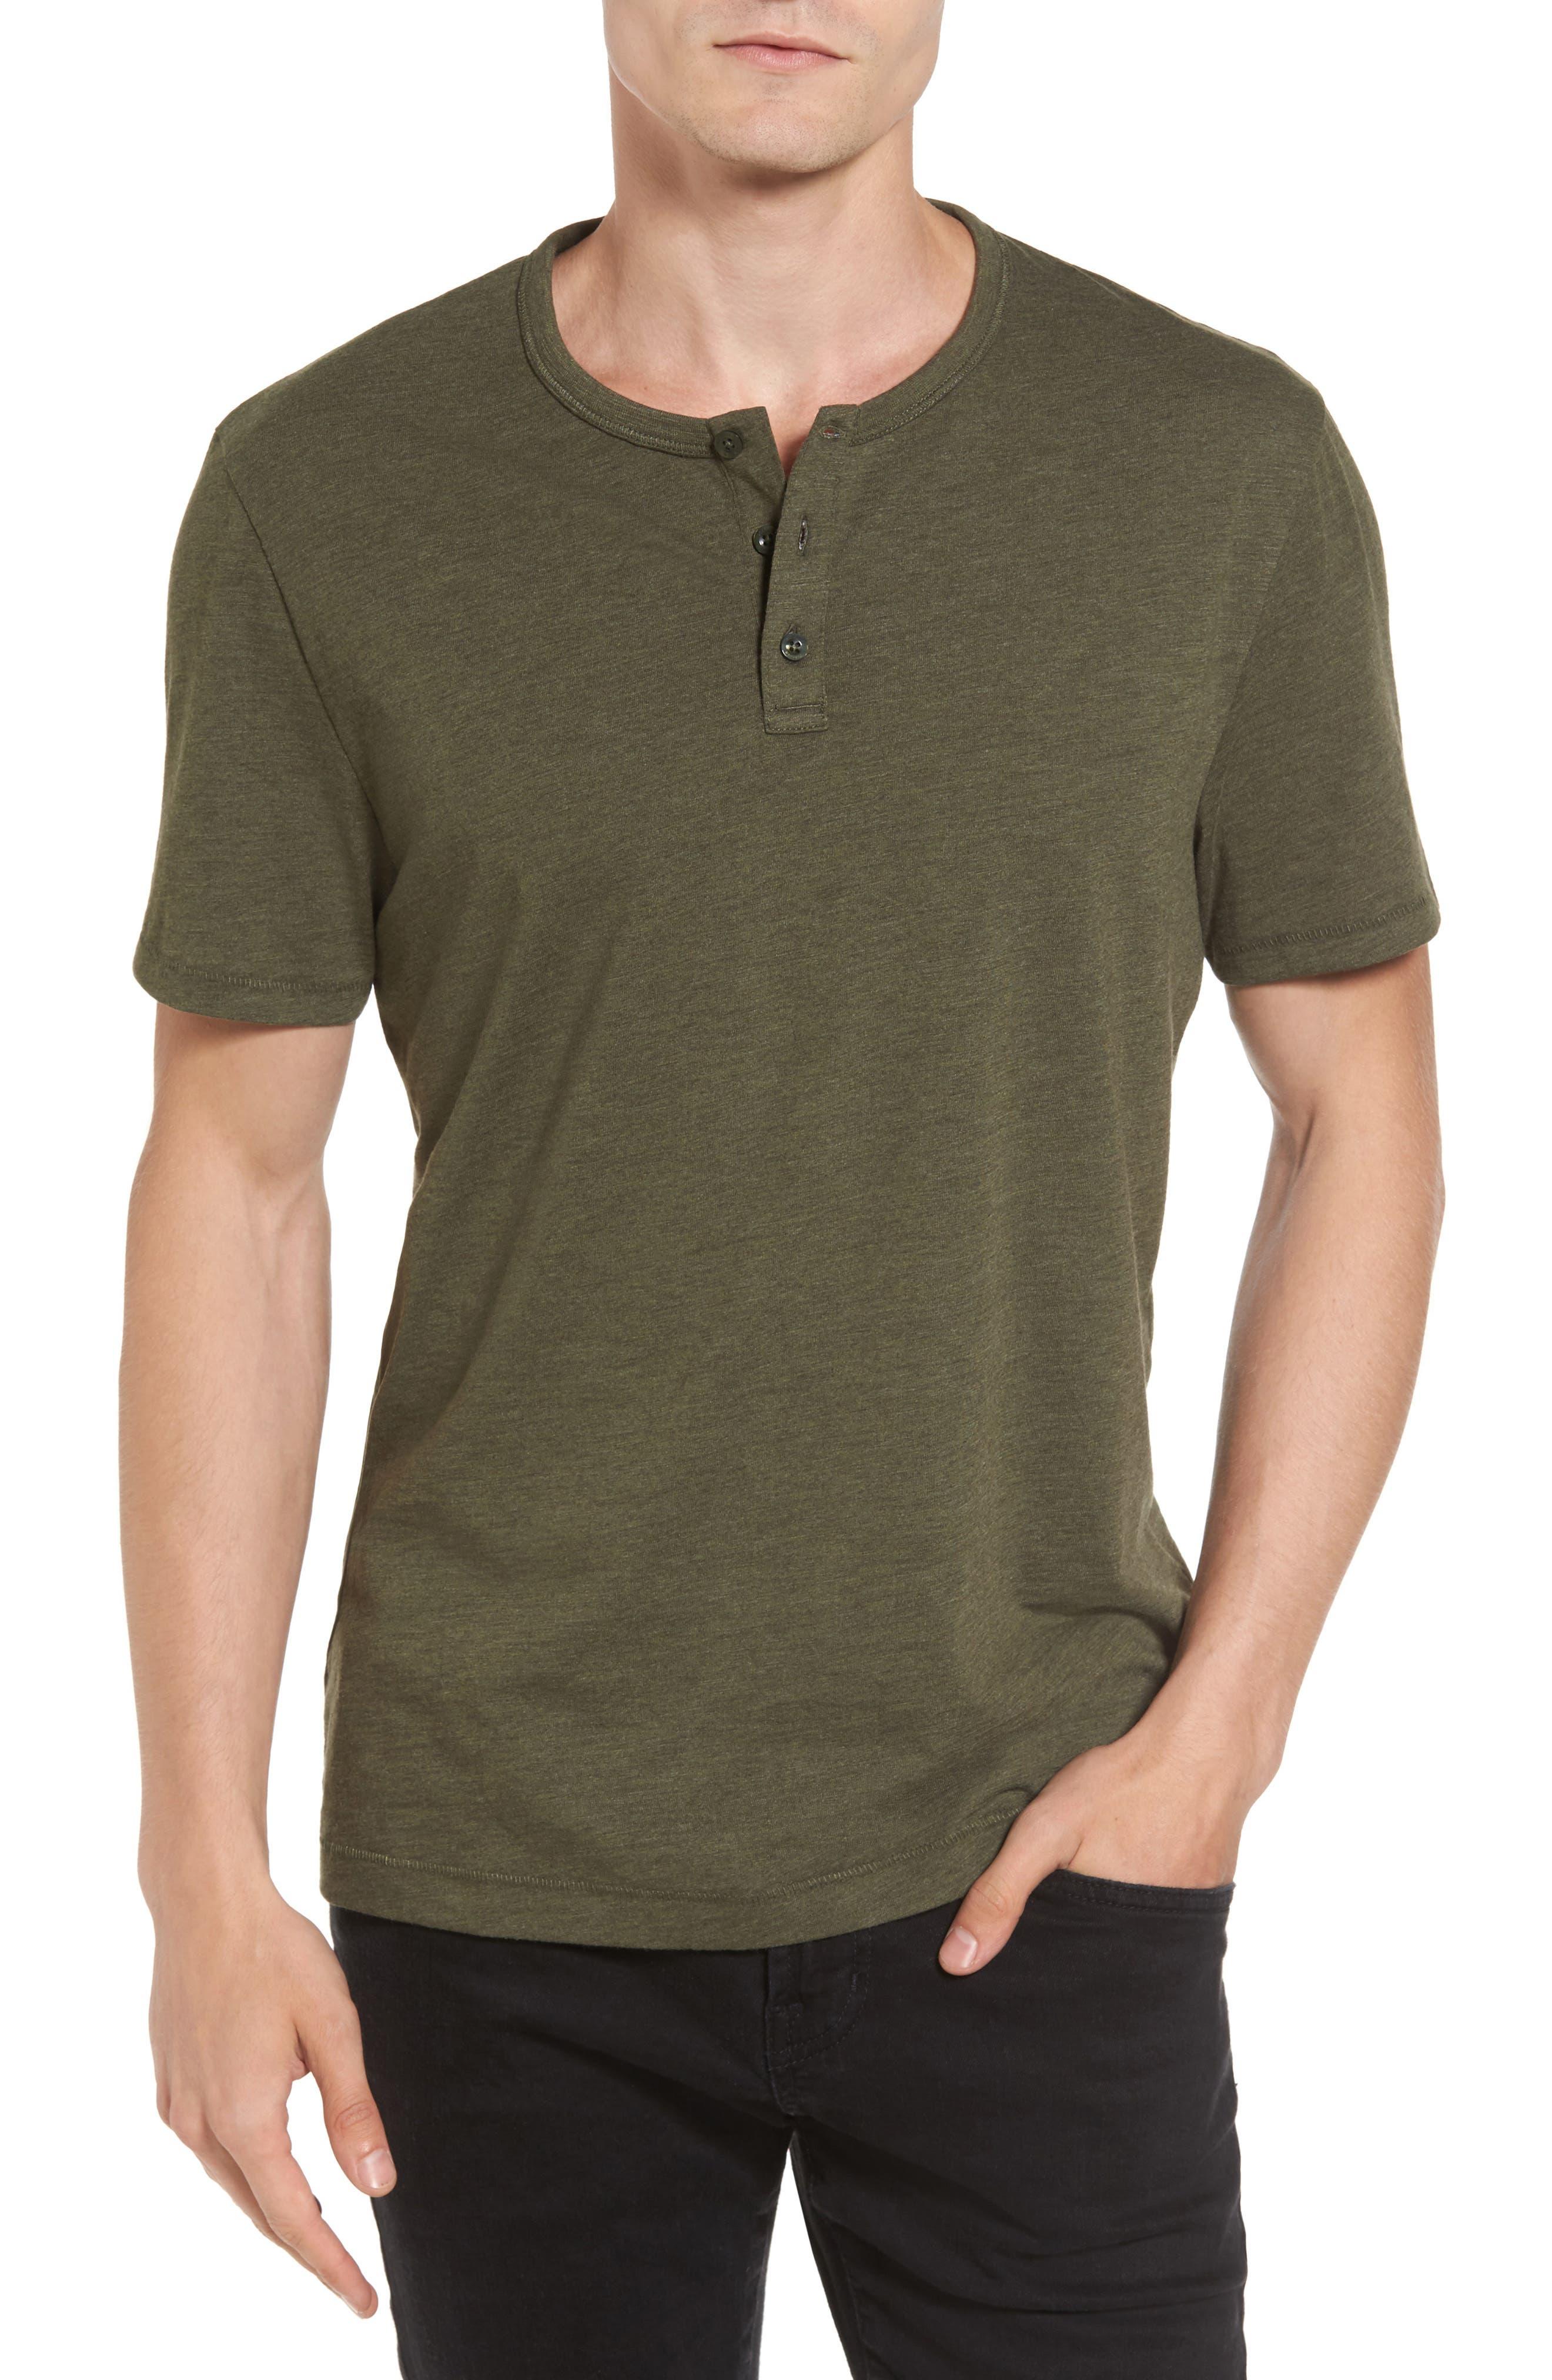 Alternate Image 1 Selected - Original Penguin Bing Short Sleeve Henley Shirt